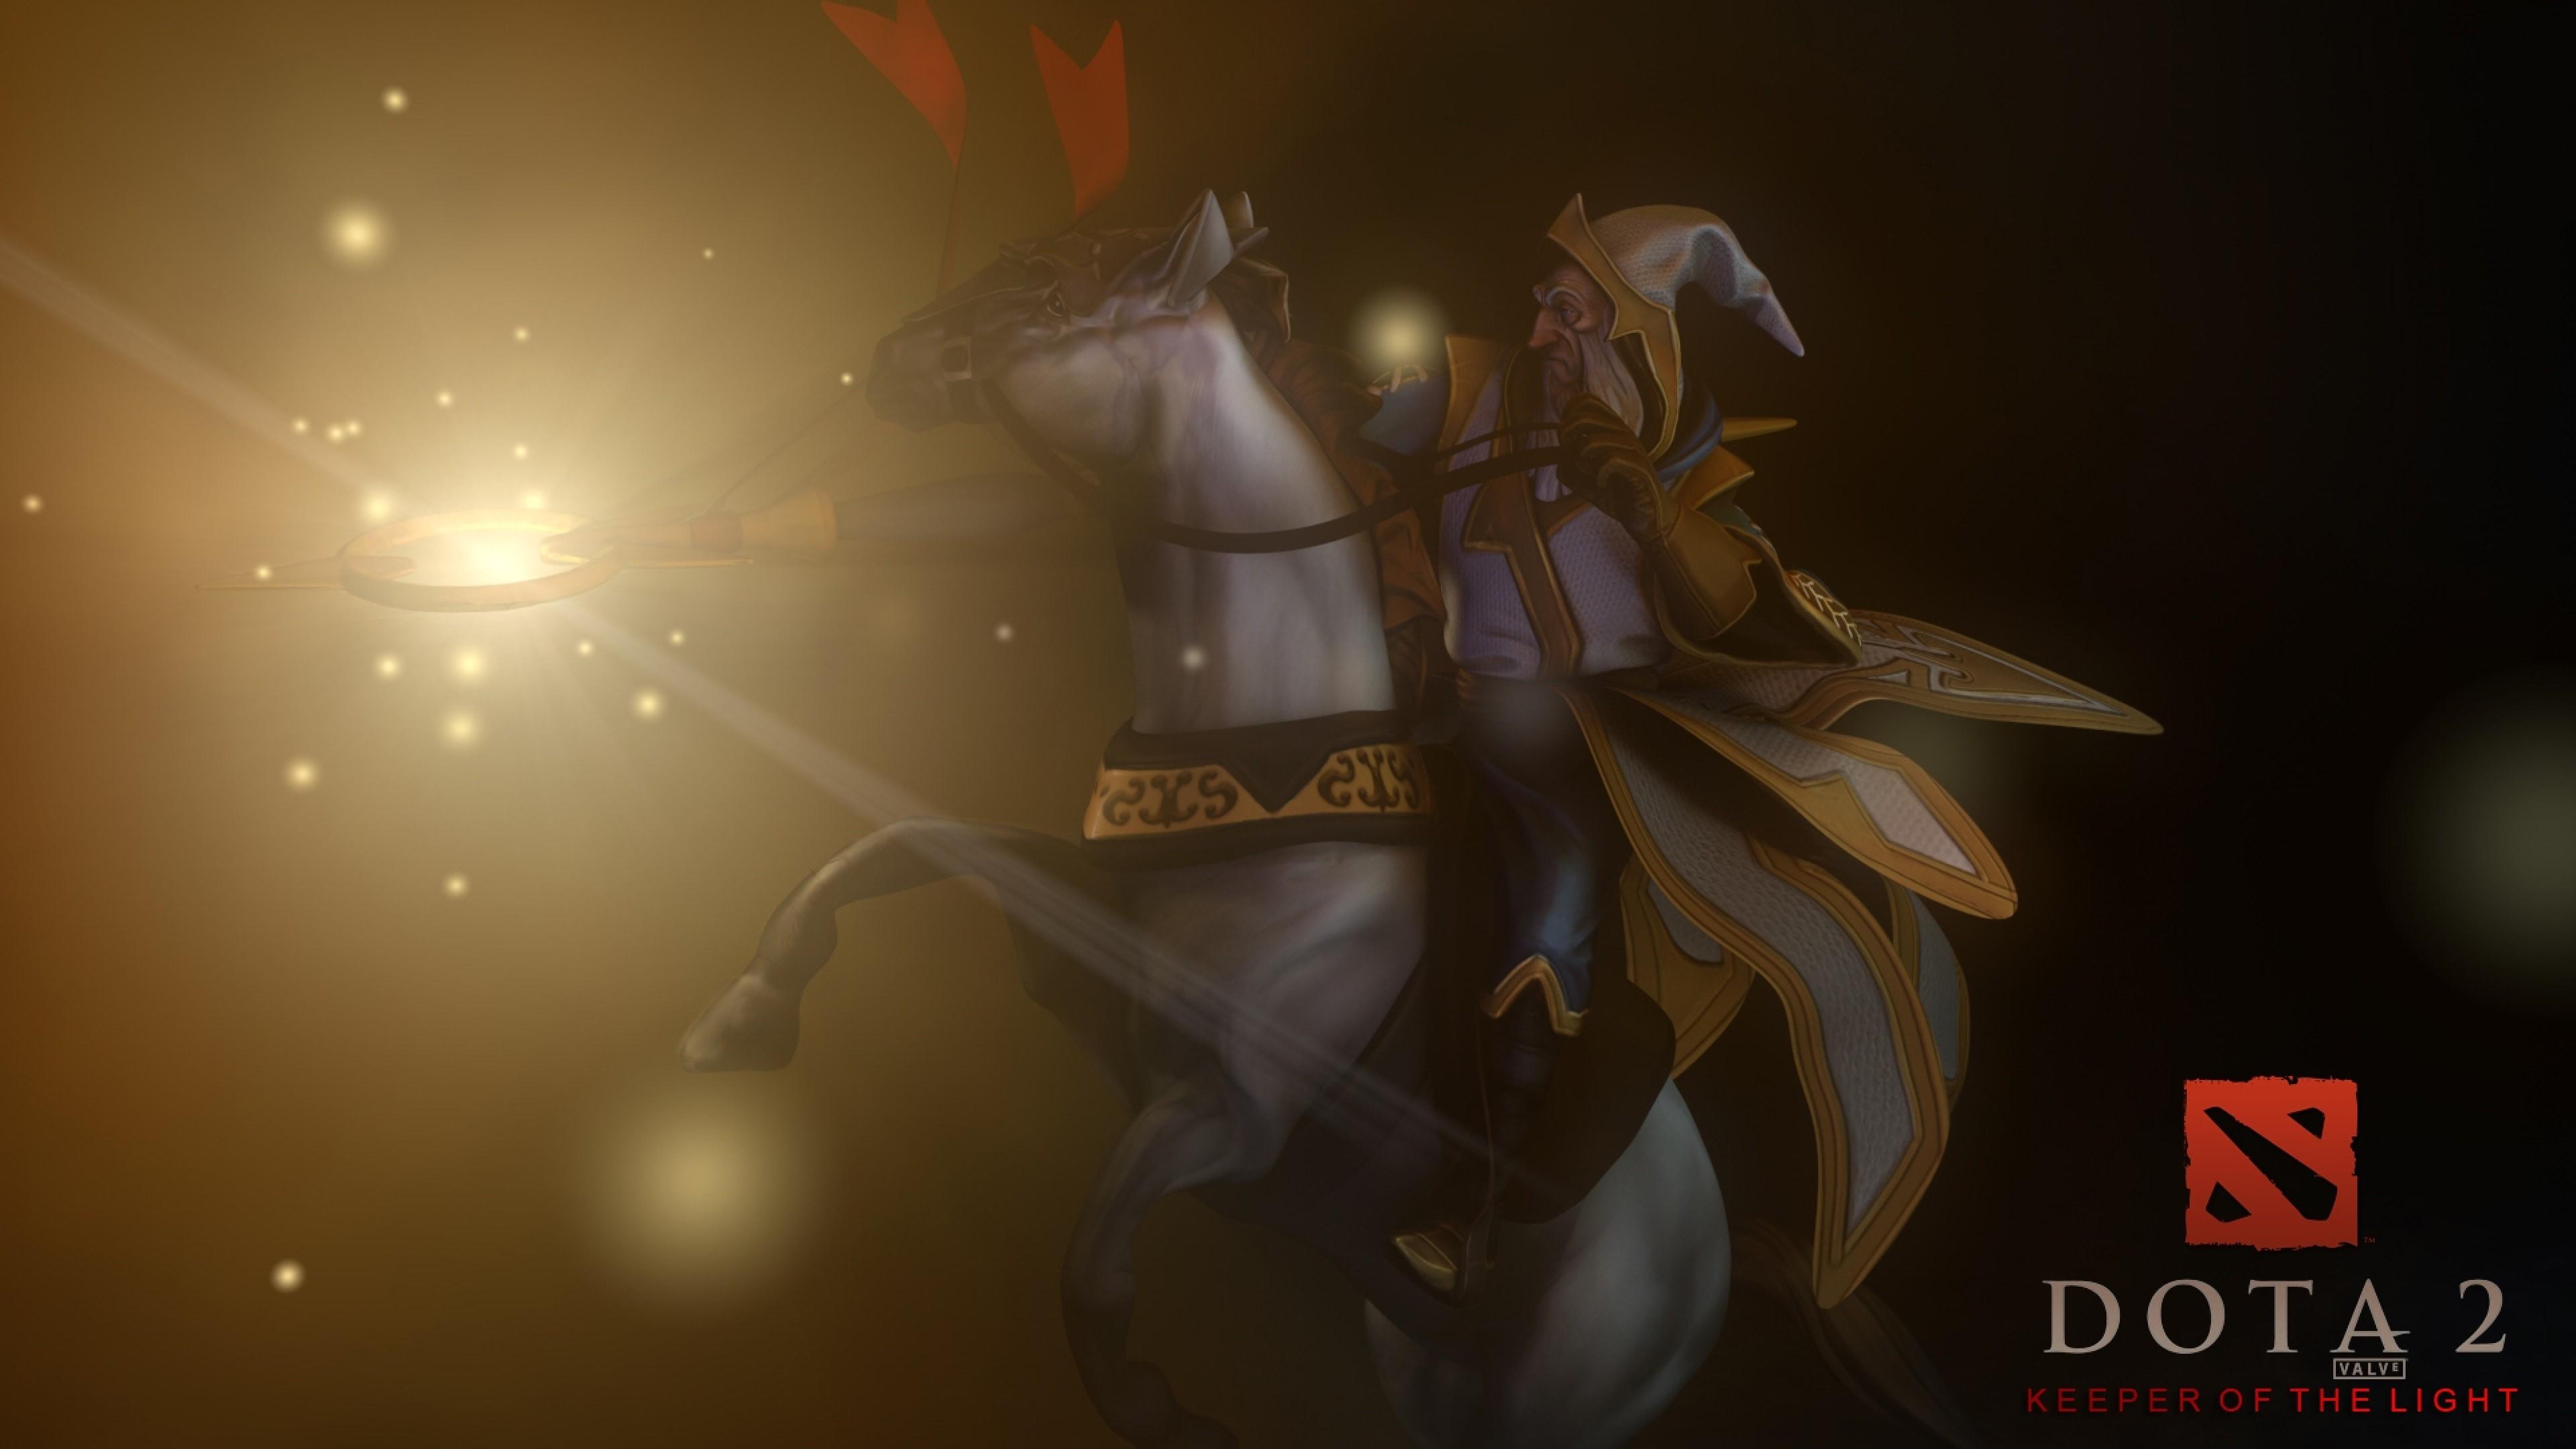 Beautiful Dota2 Keeper Of the Light Hd Desktop Wallpapers